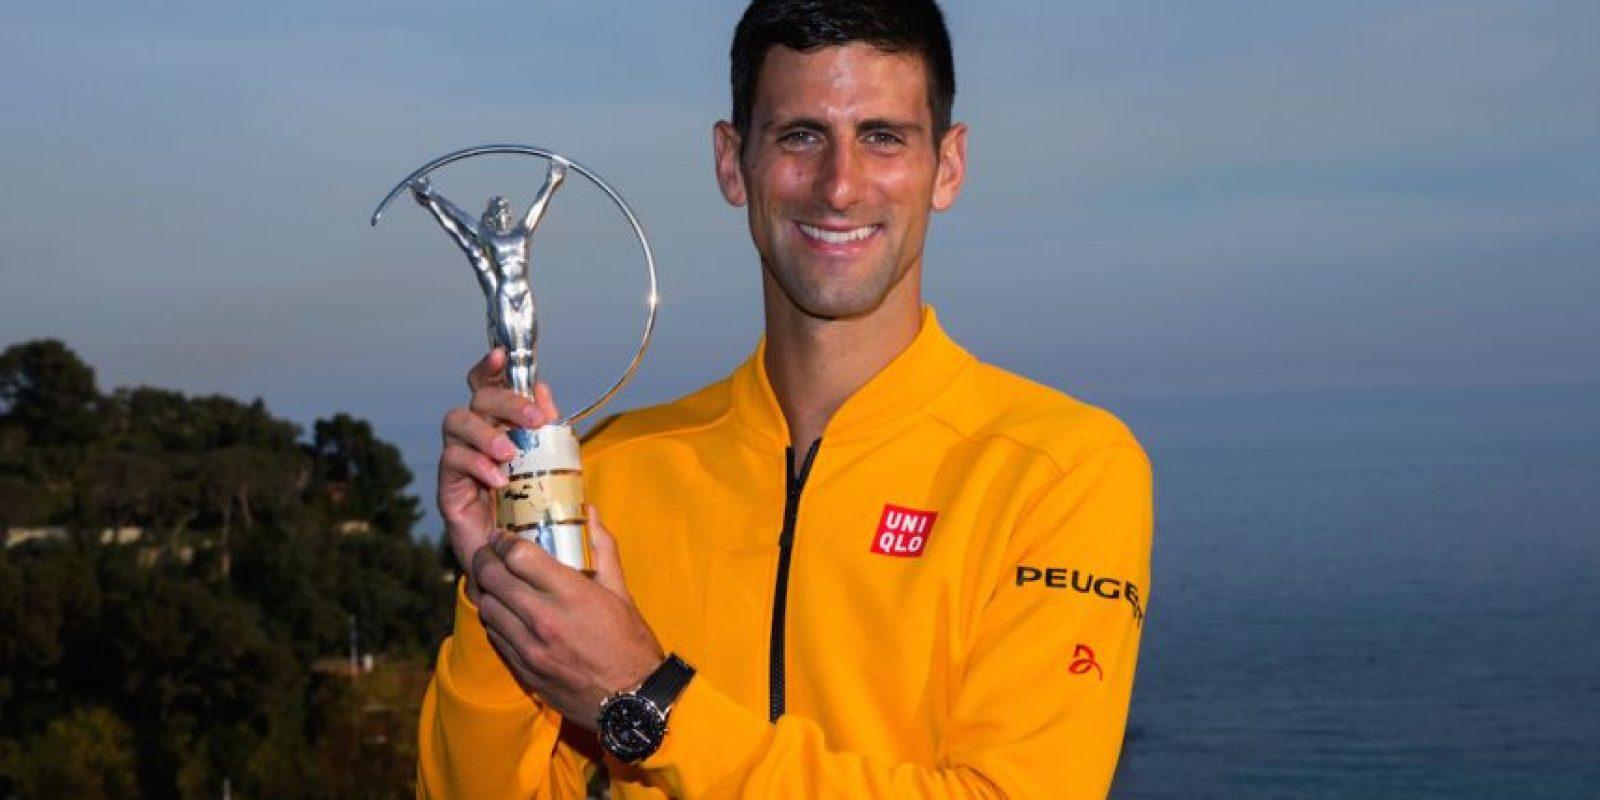 18. Novak Djokovic @djokernole (Tenis/Serbia): 26 mil 530 dólares por tuit. Foto:Getty Images